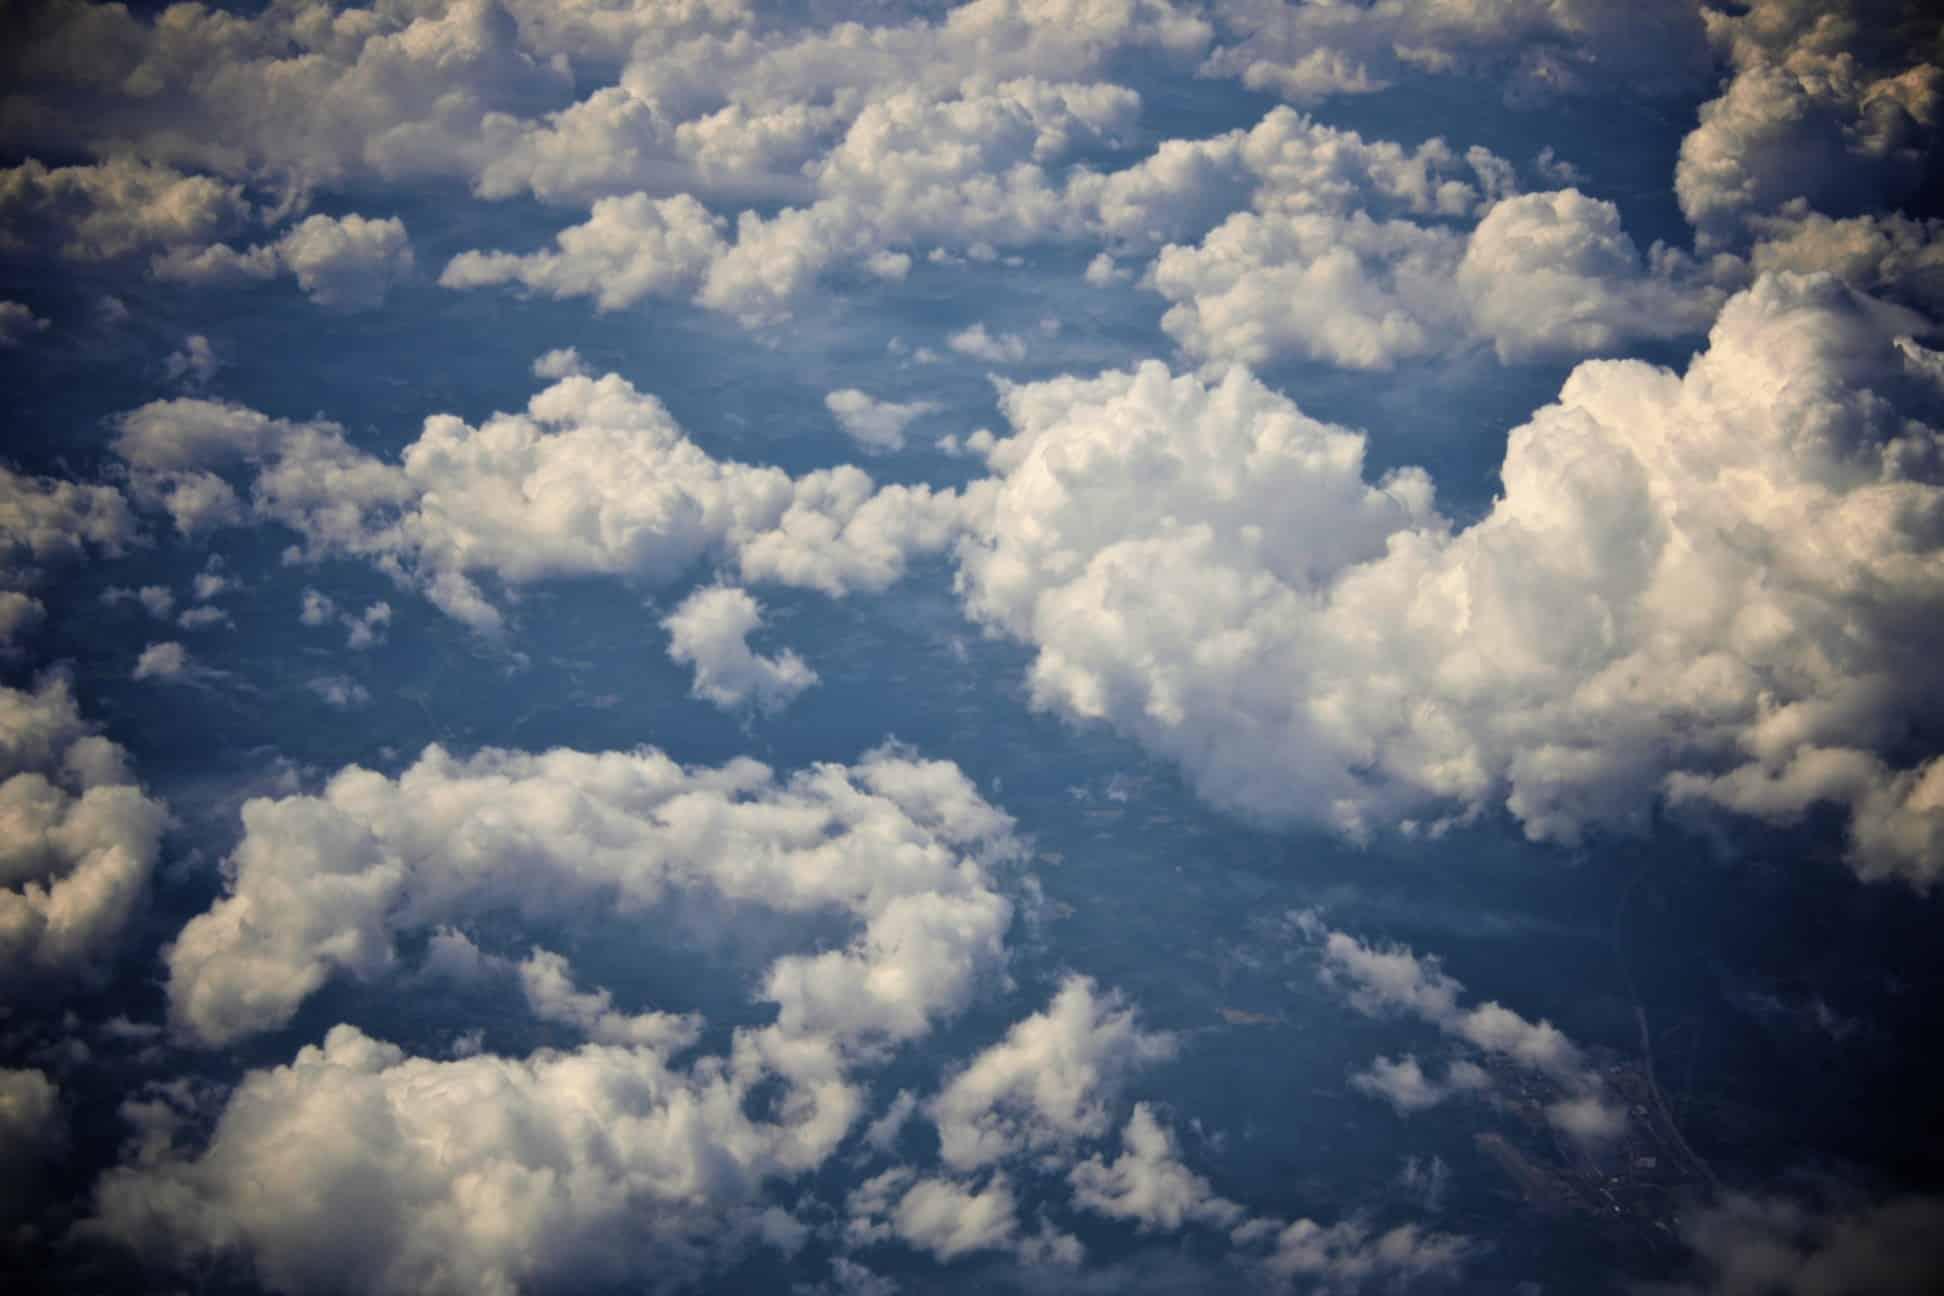 Clouds Wallpaper 007